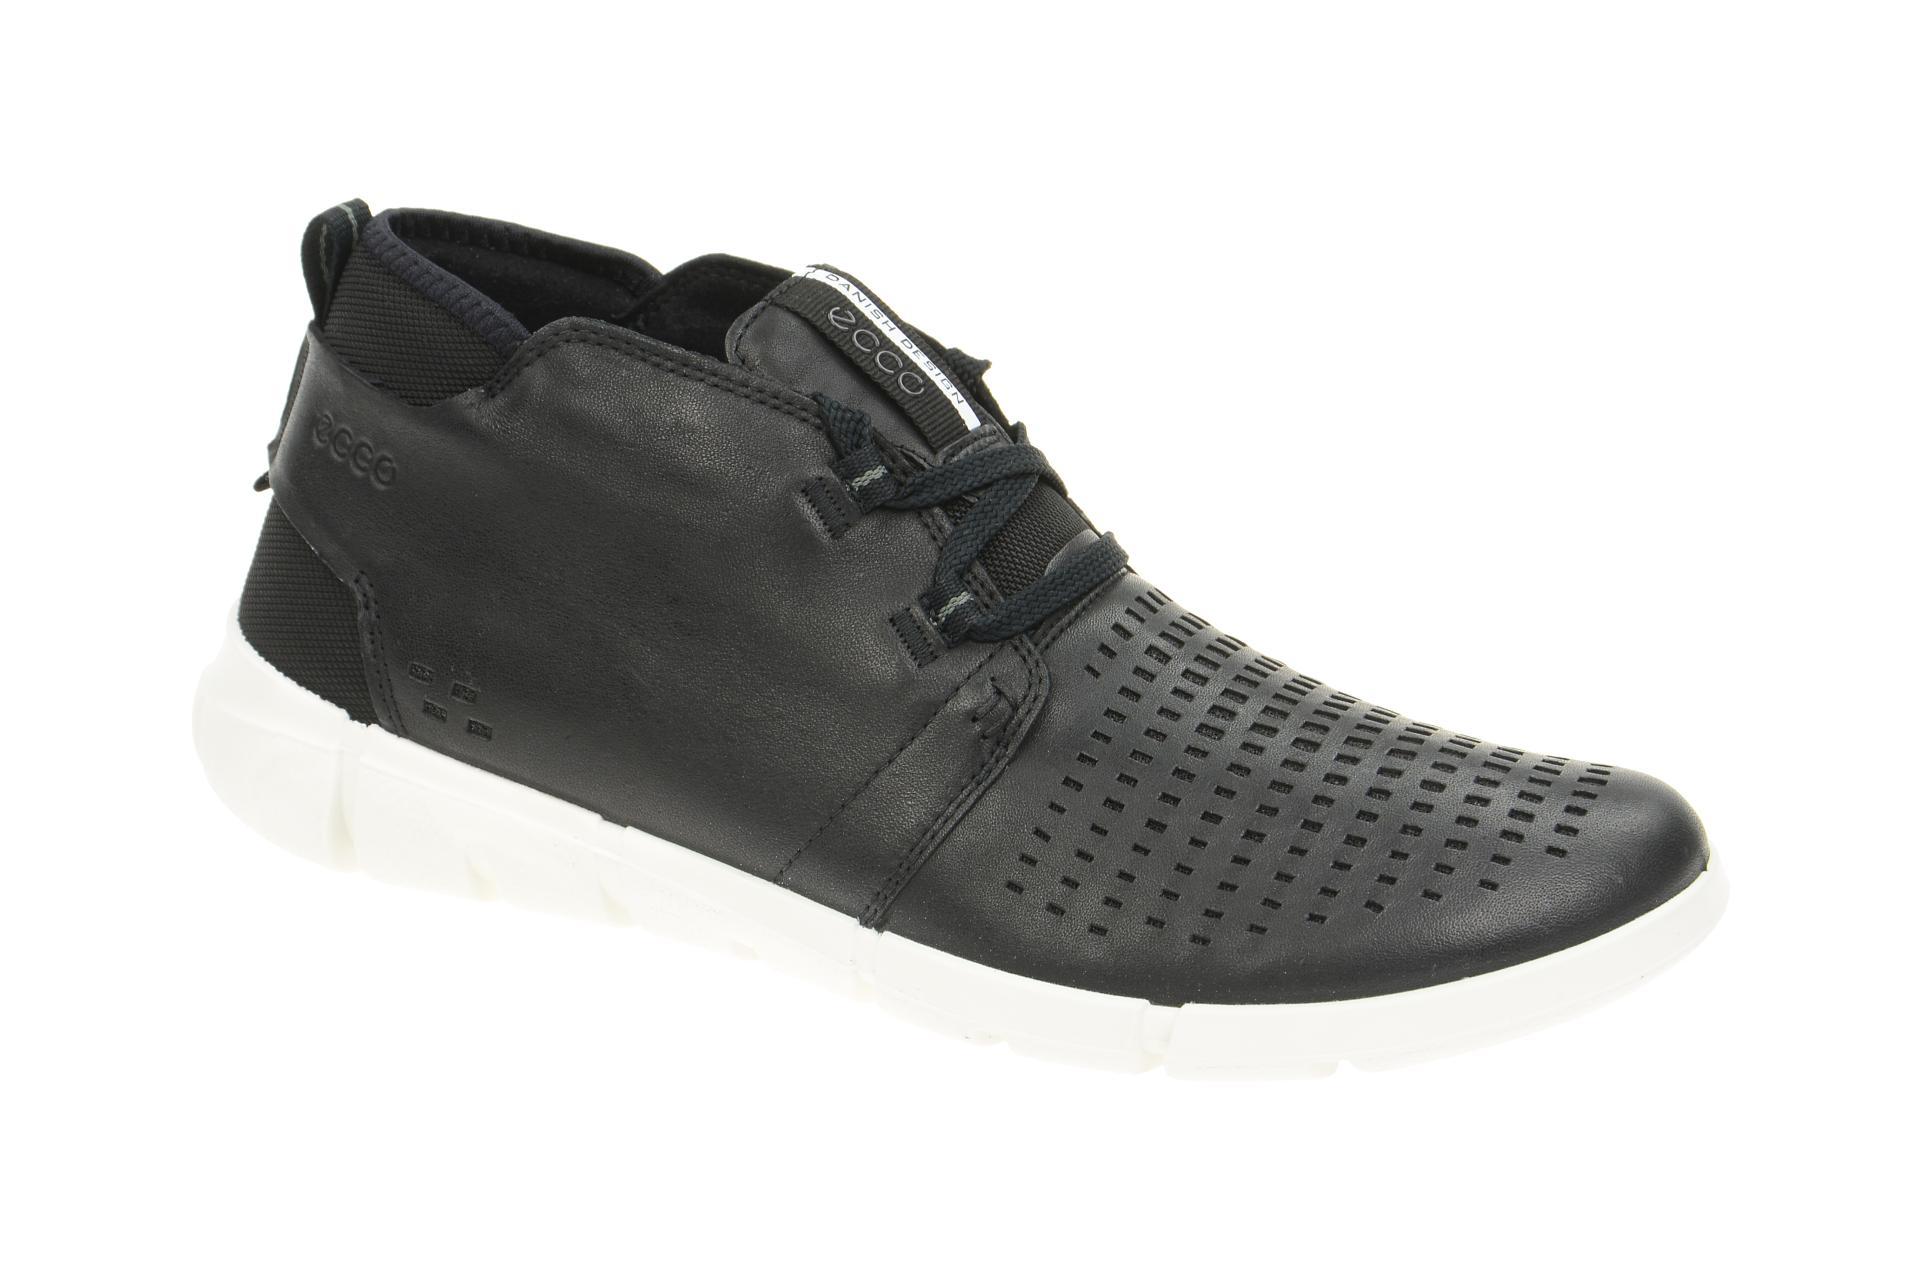 e717daba0a Ecco Schuhe Intrinsic 1 schwarz Herren Boots - Schuhhaus Strauch Shop